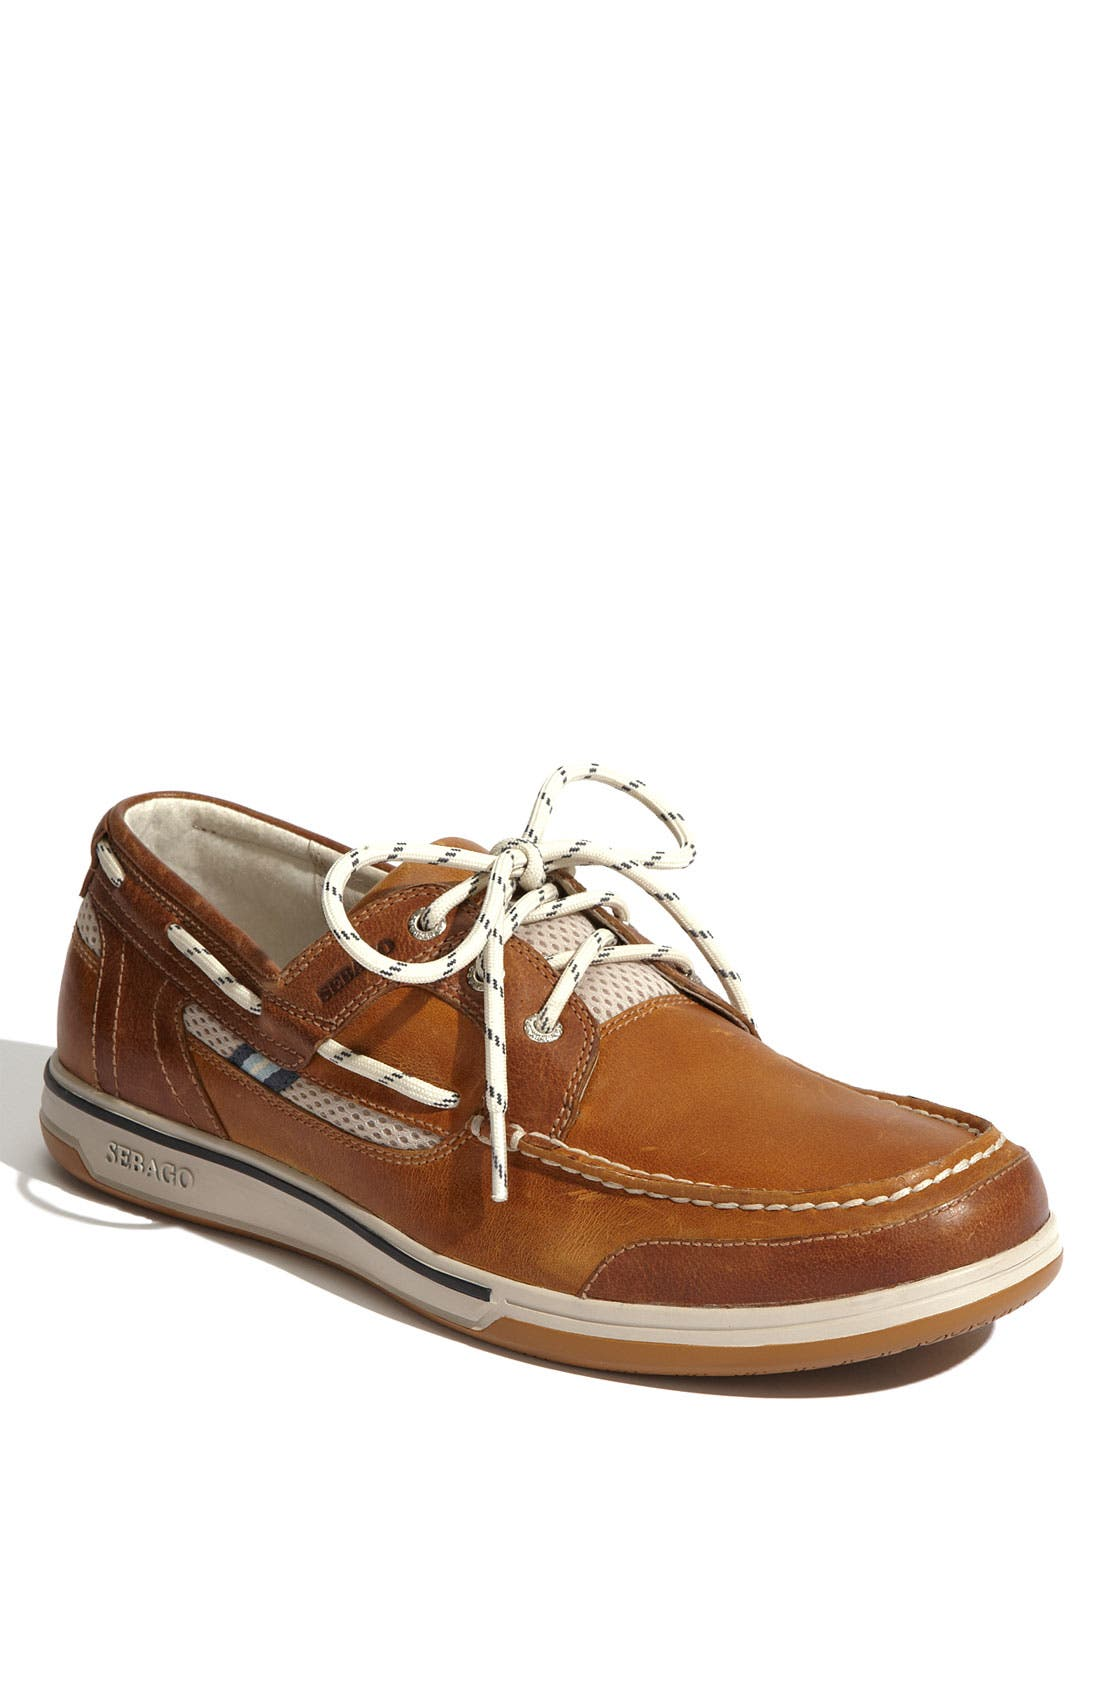 'Triton' Boat Shoe,                             Main thumbnail 1, color,                             236